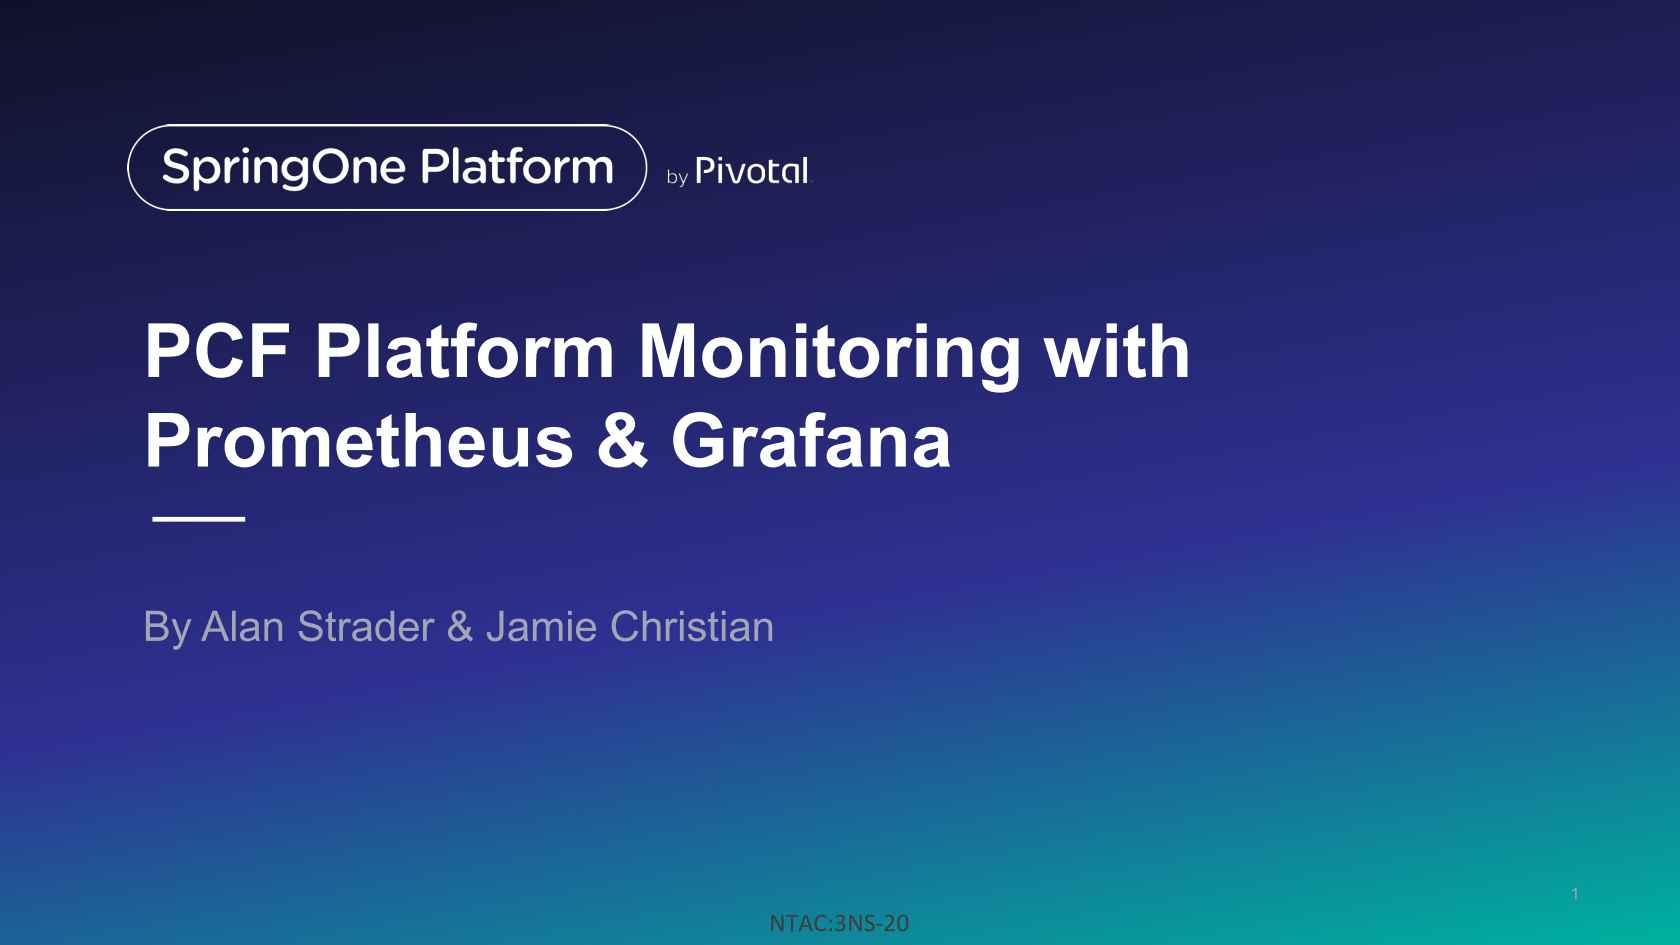 PCF Platform Monitoring with Prometheus and Grafana